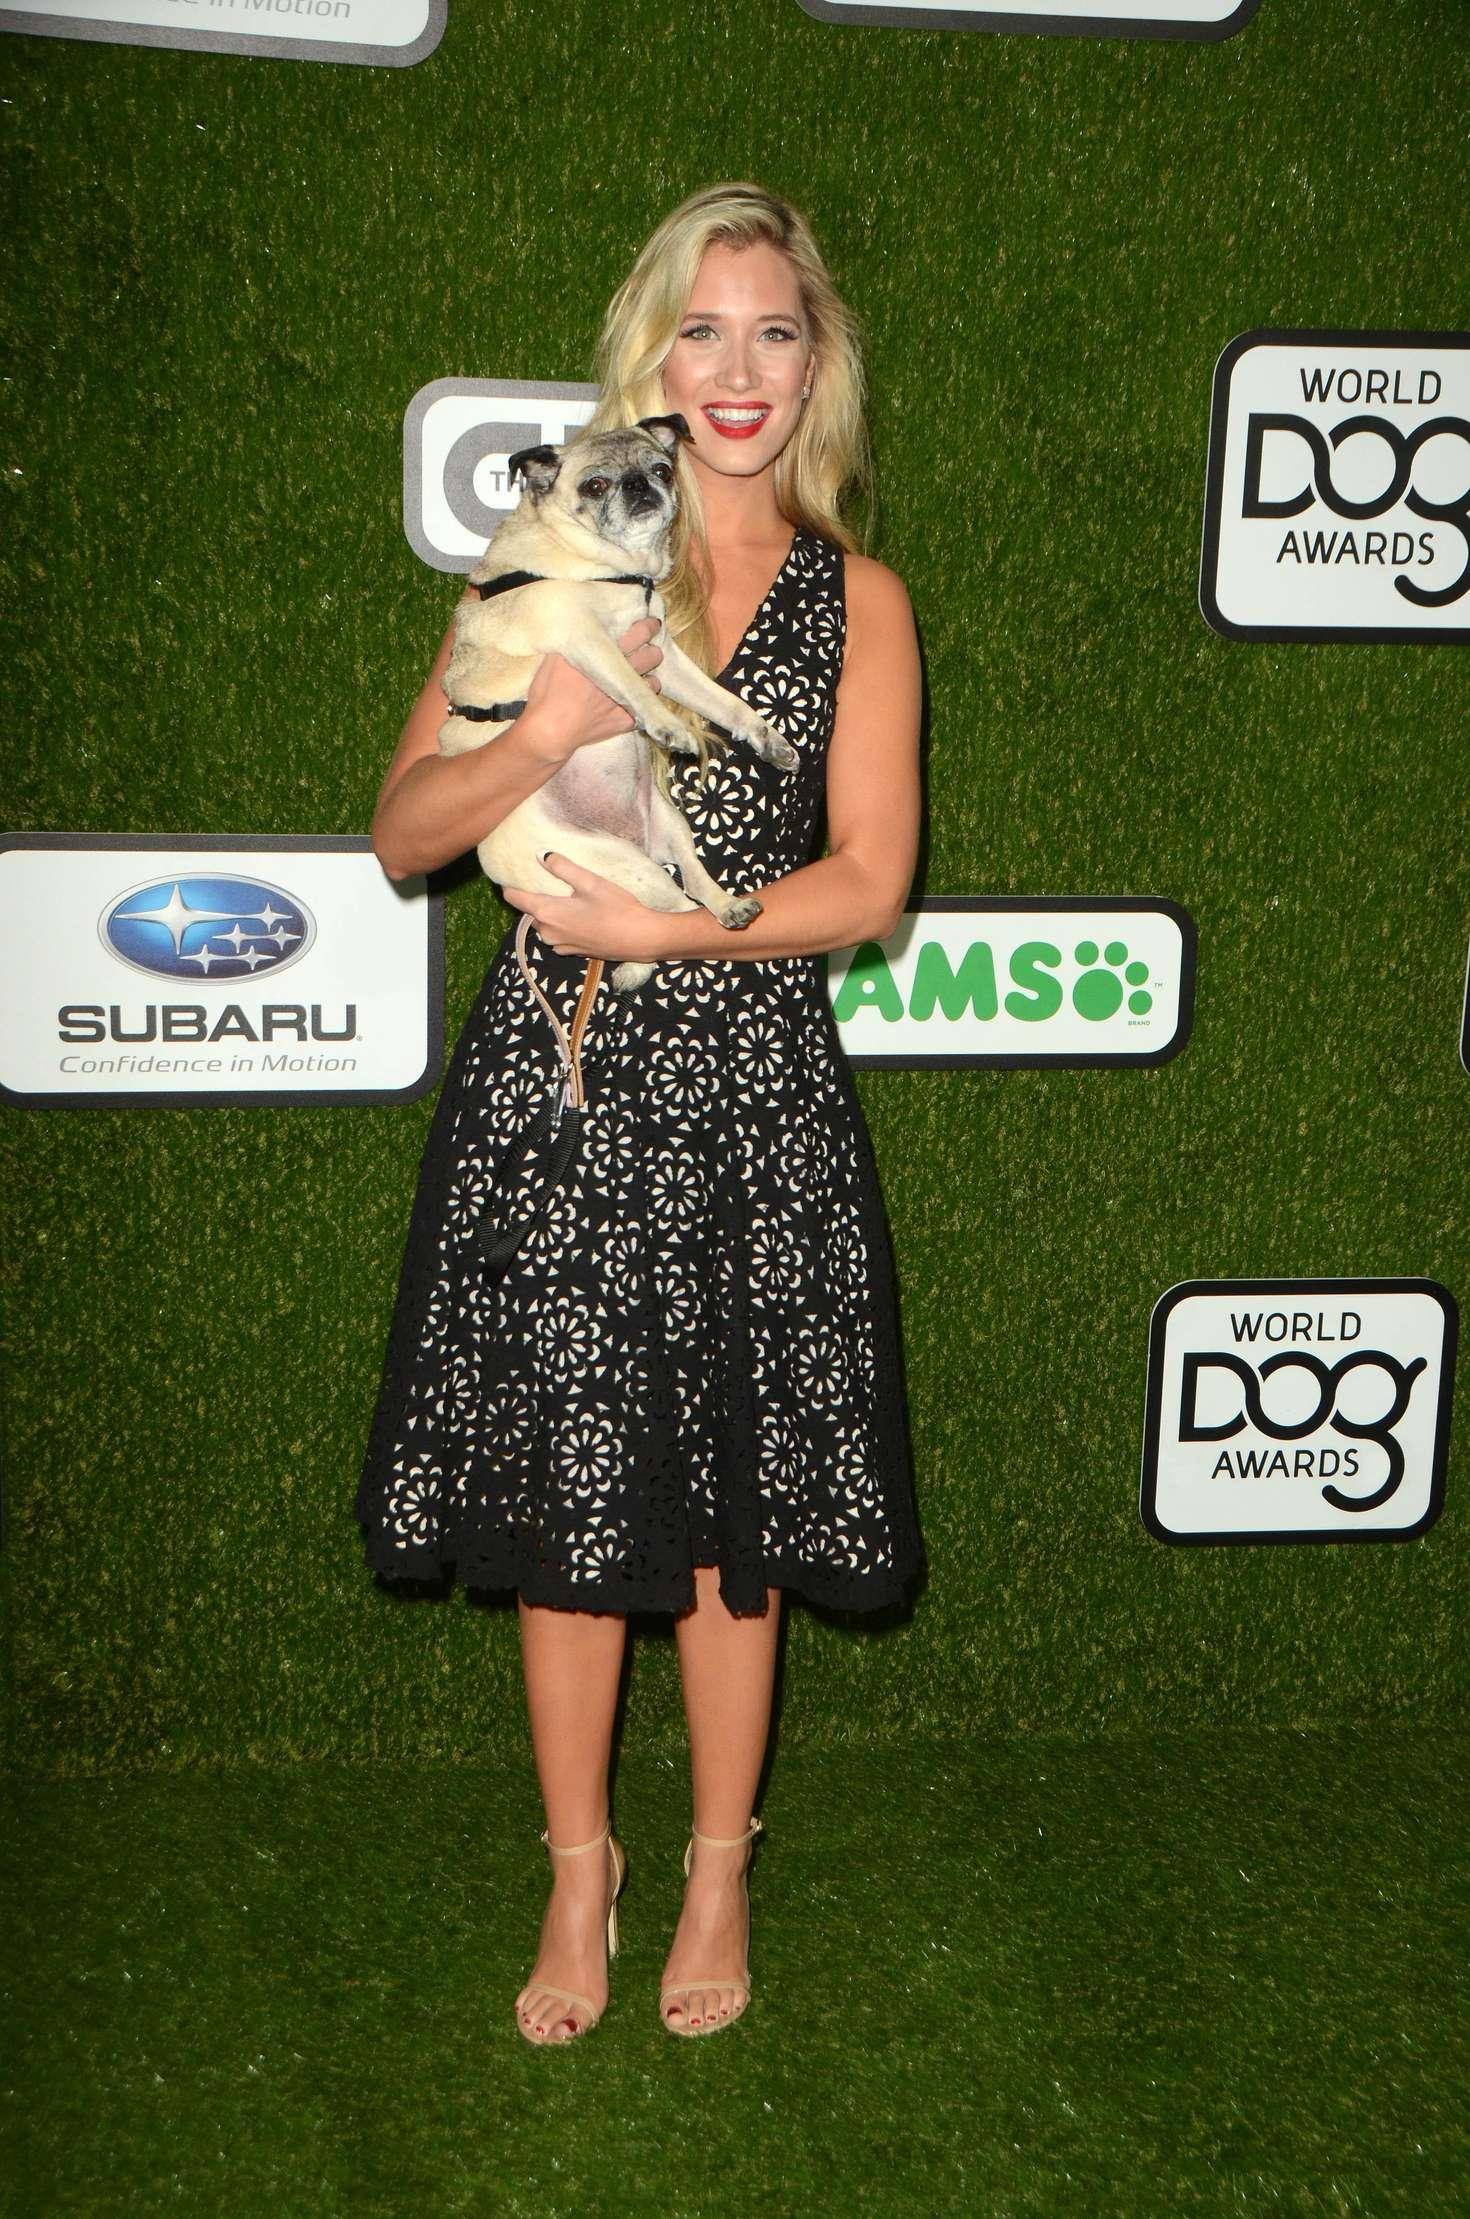 Kristine Leahy World Dog Awards in Santa Monica